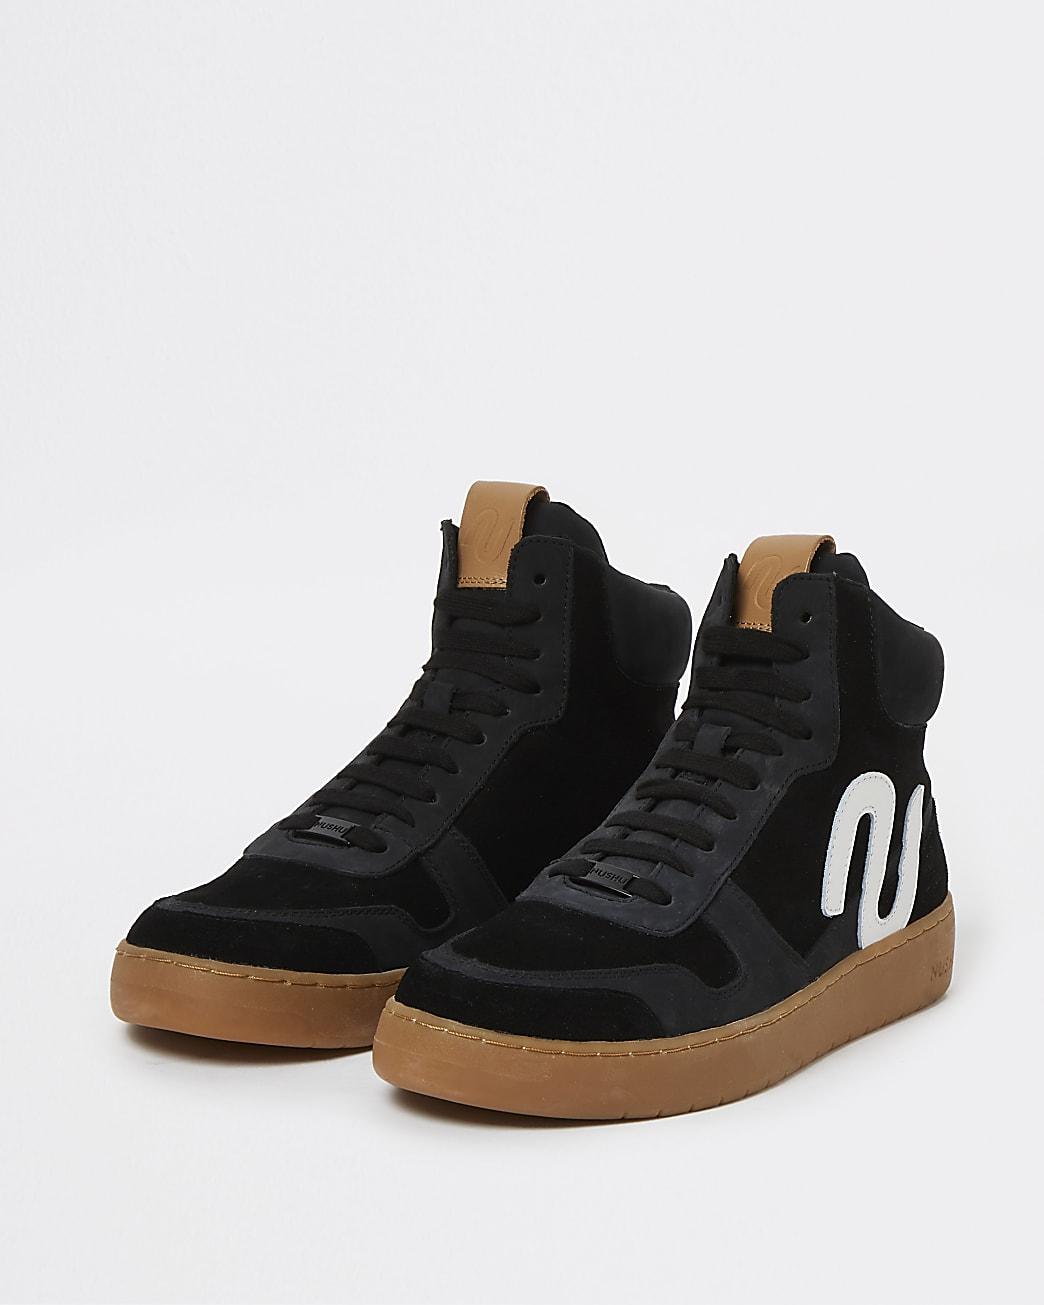 Nushu black 3D trim lace up high top trainers